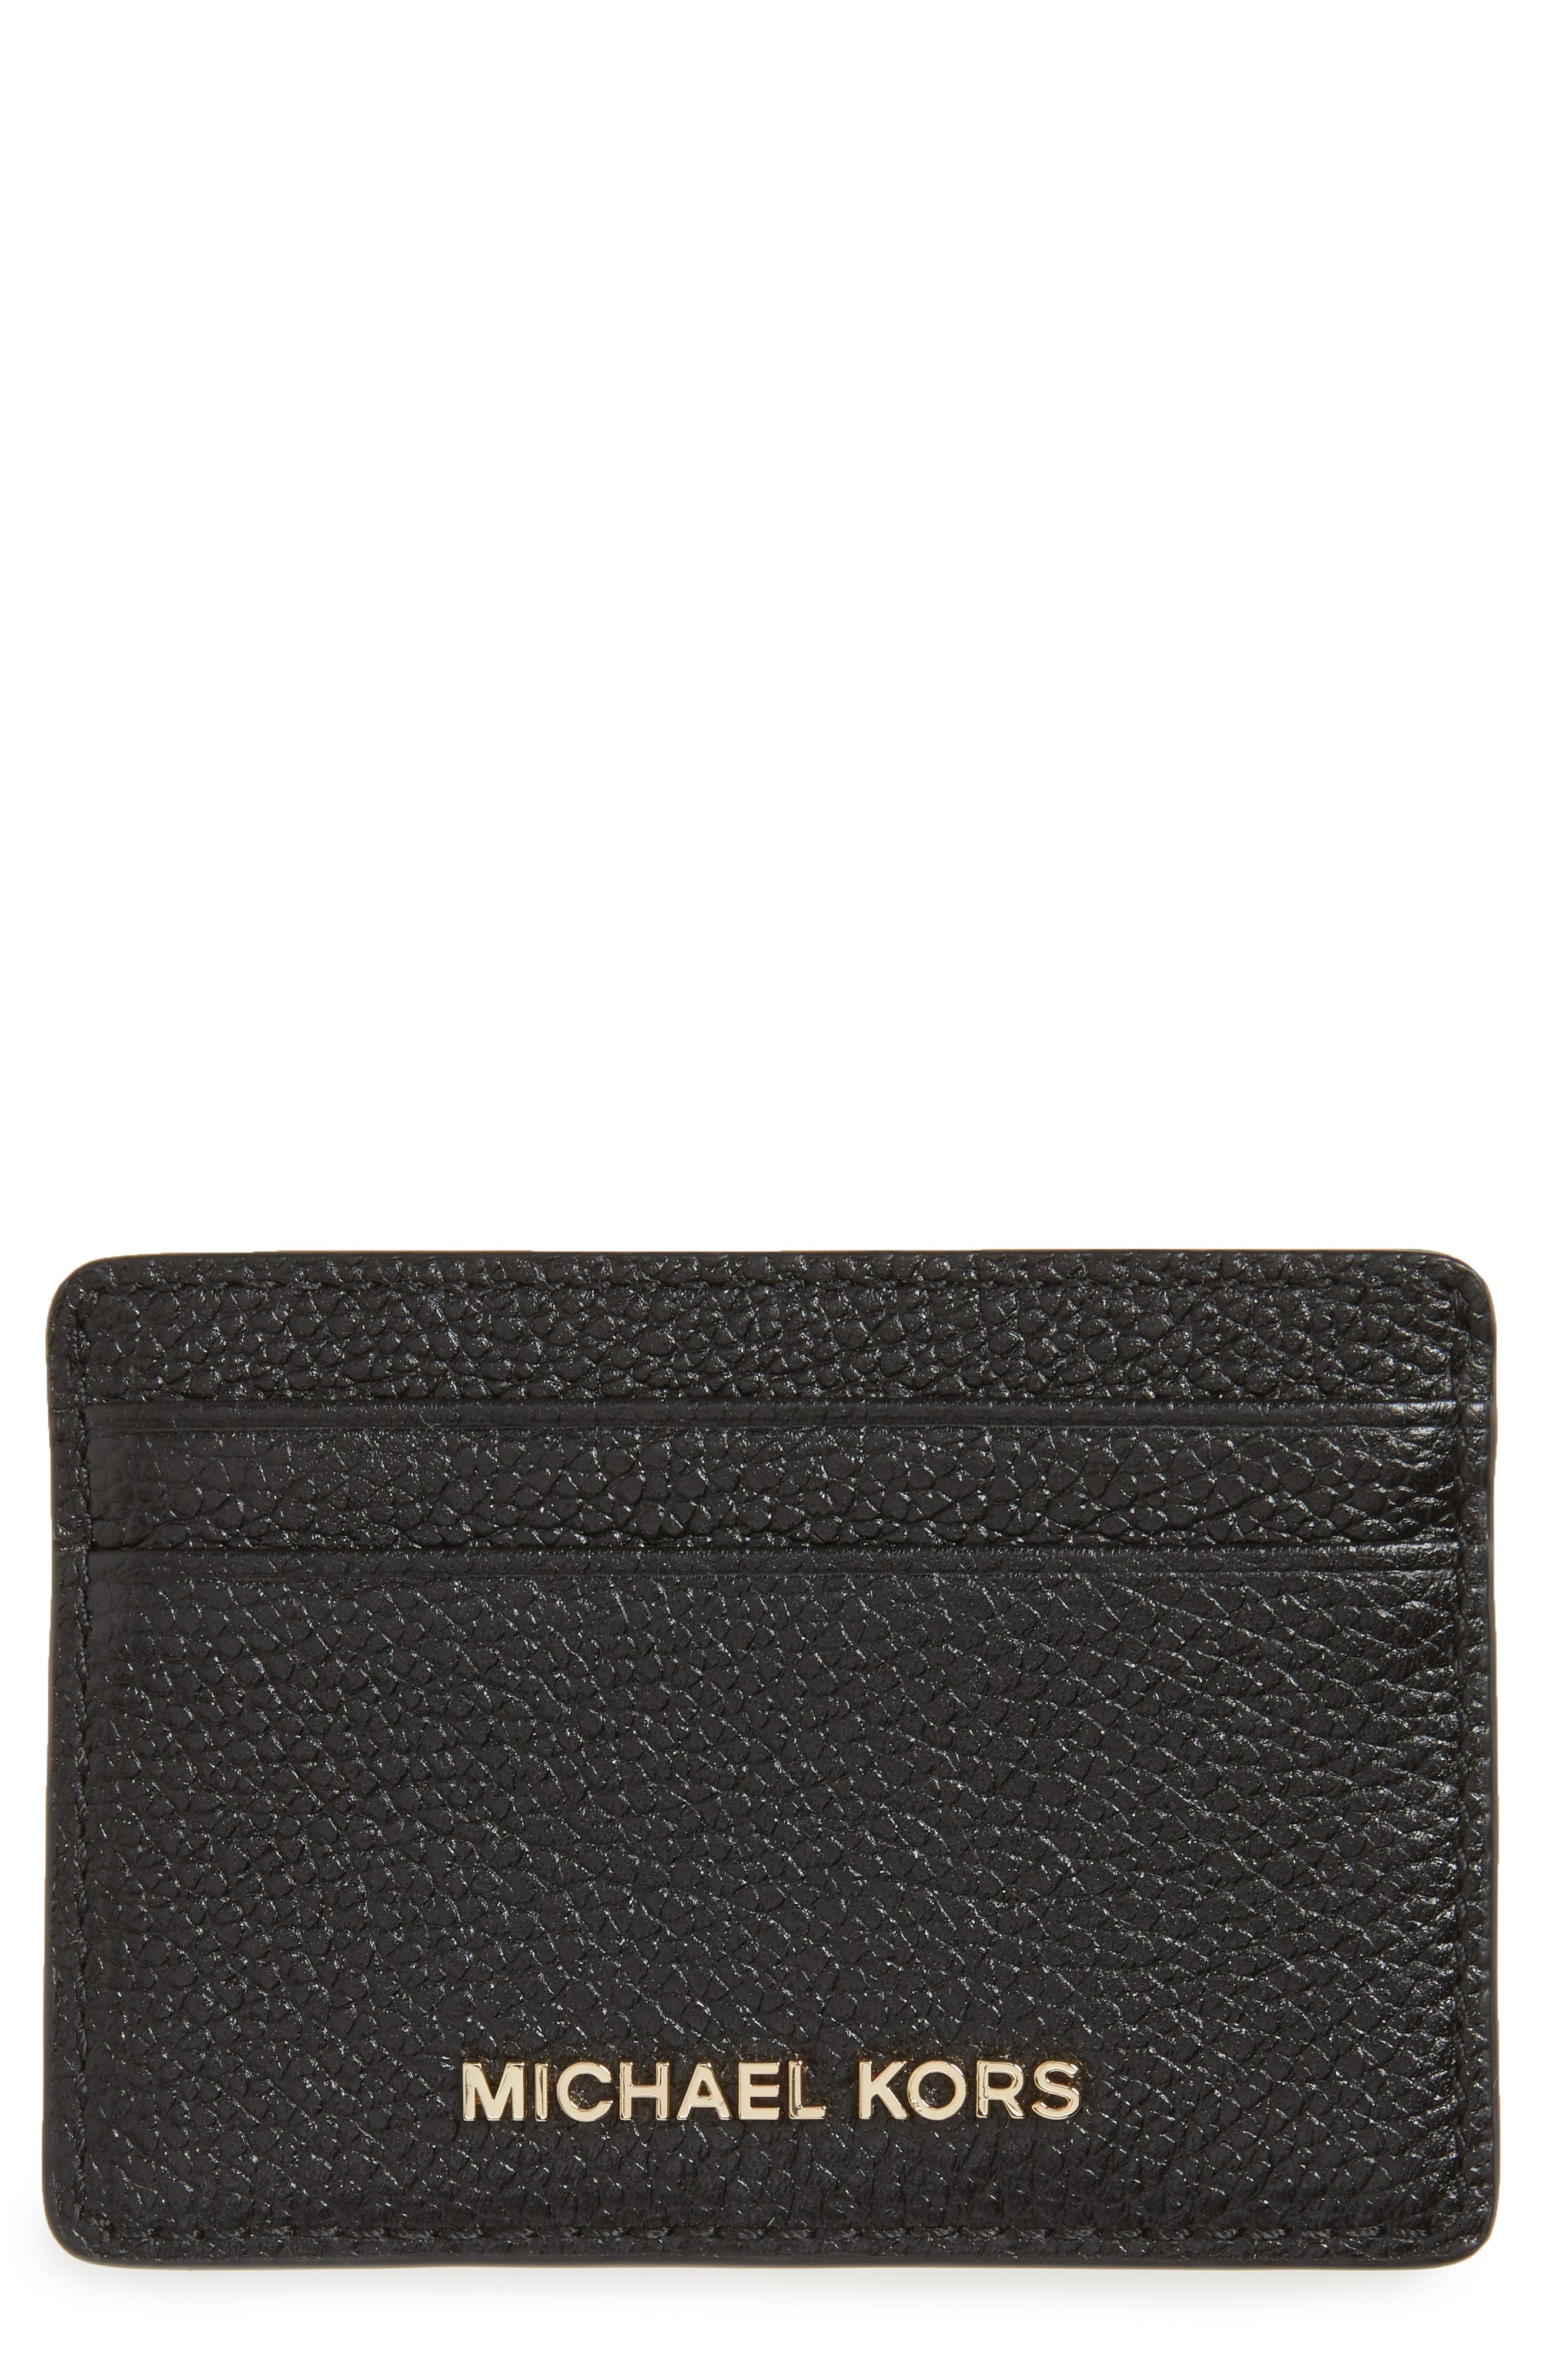 Money Pieces Leather Card Case,                         Main,                         color, 001